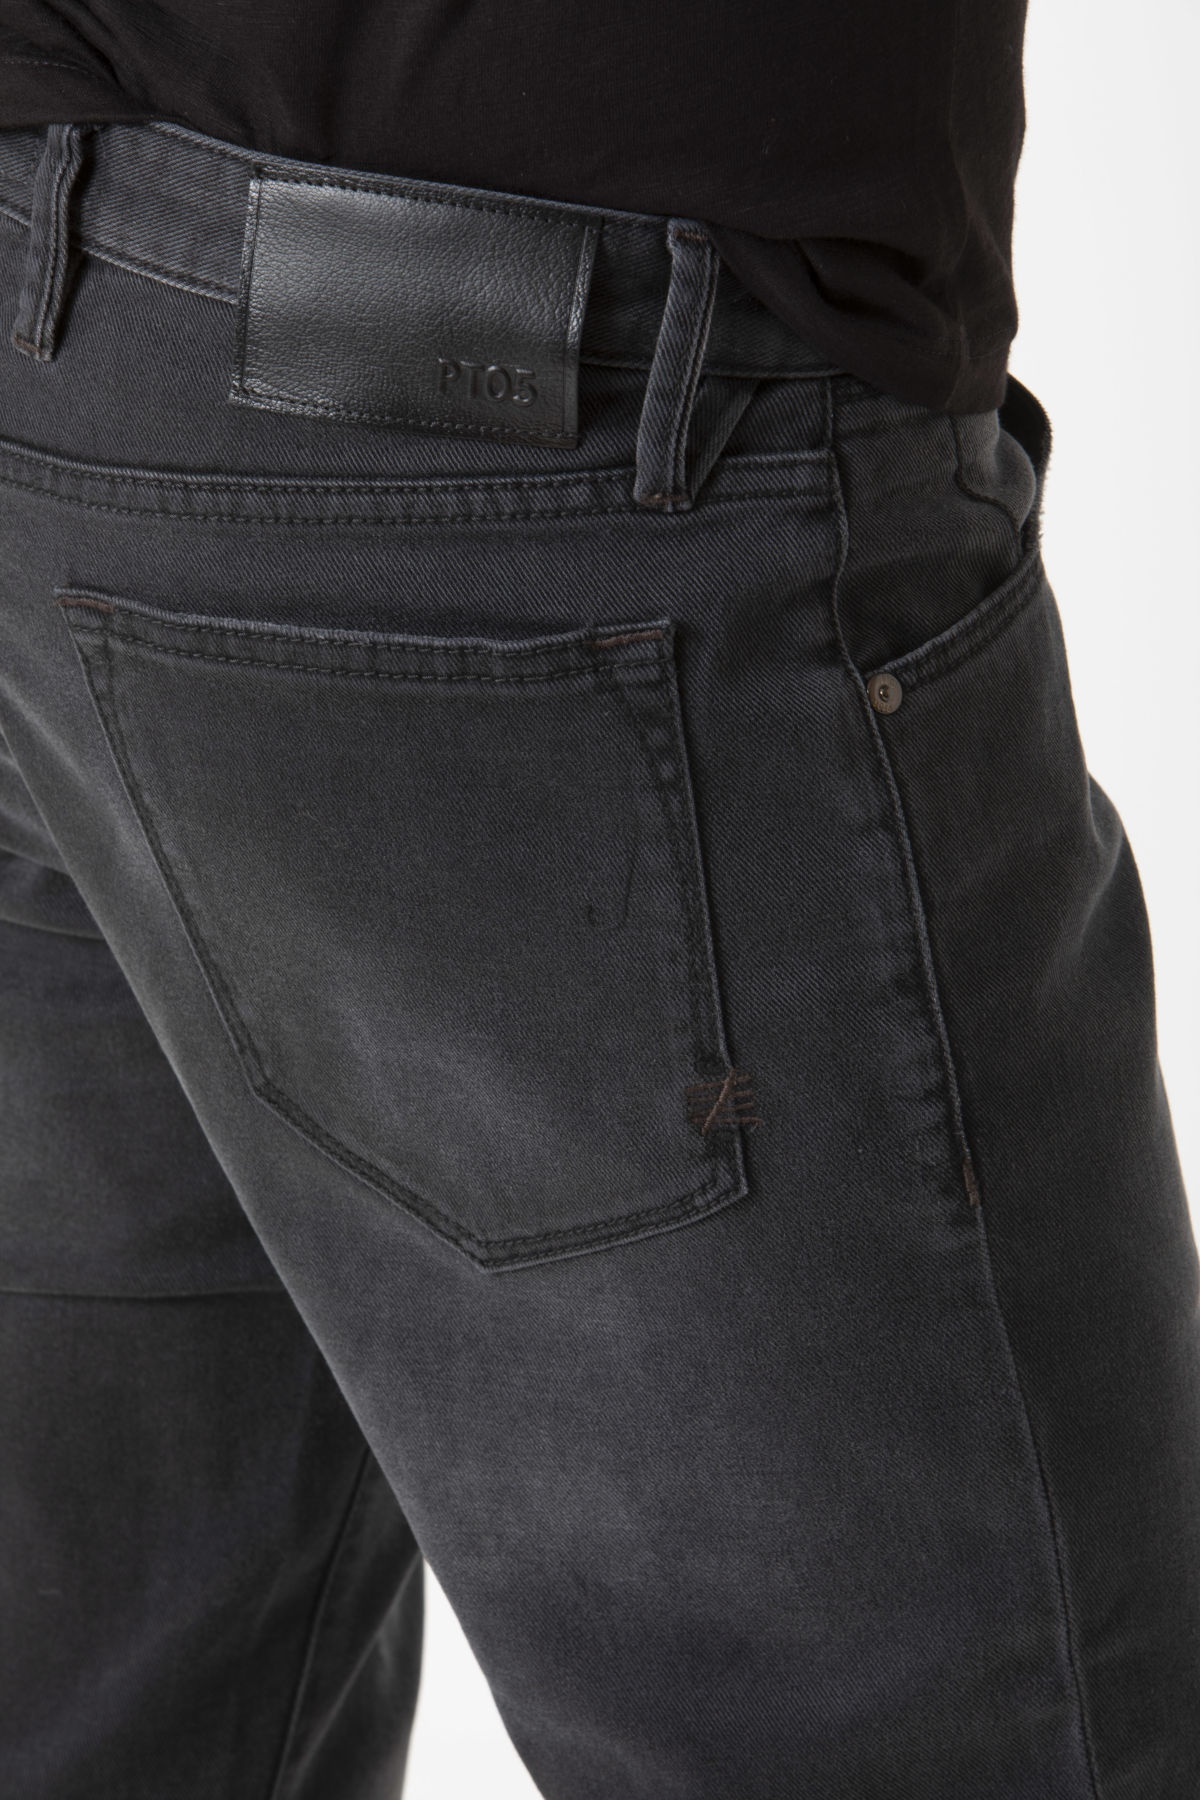 Jeans per uomo PT05 A/I 19-20